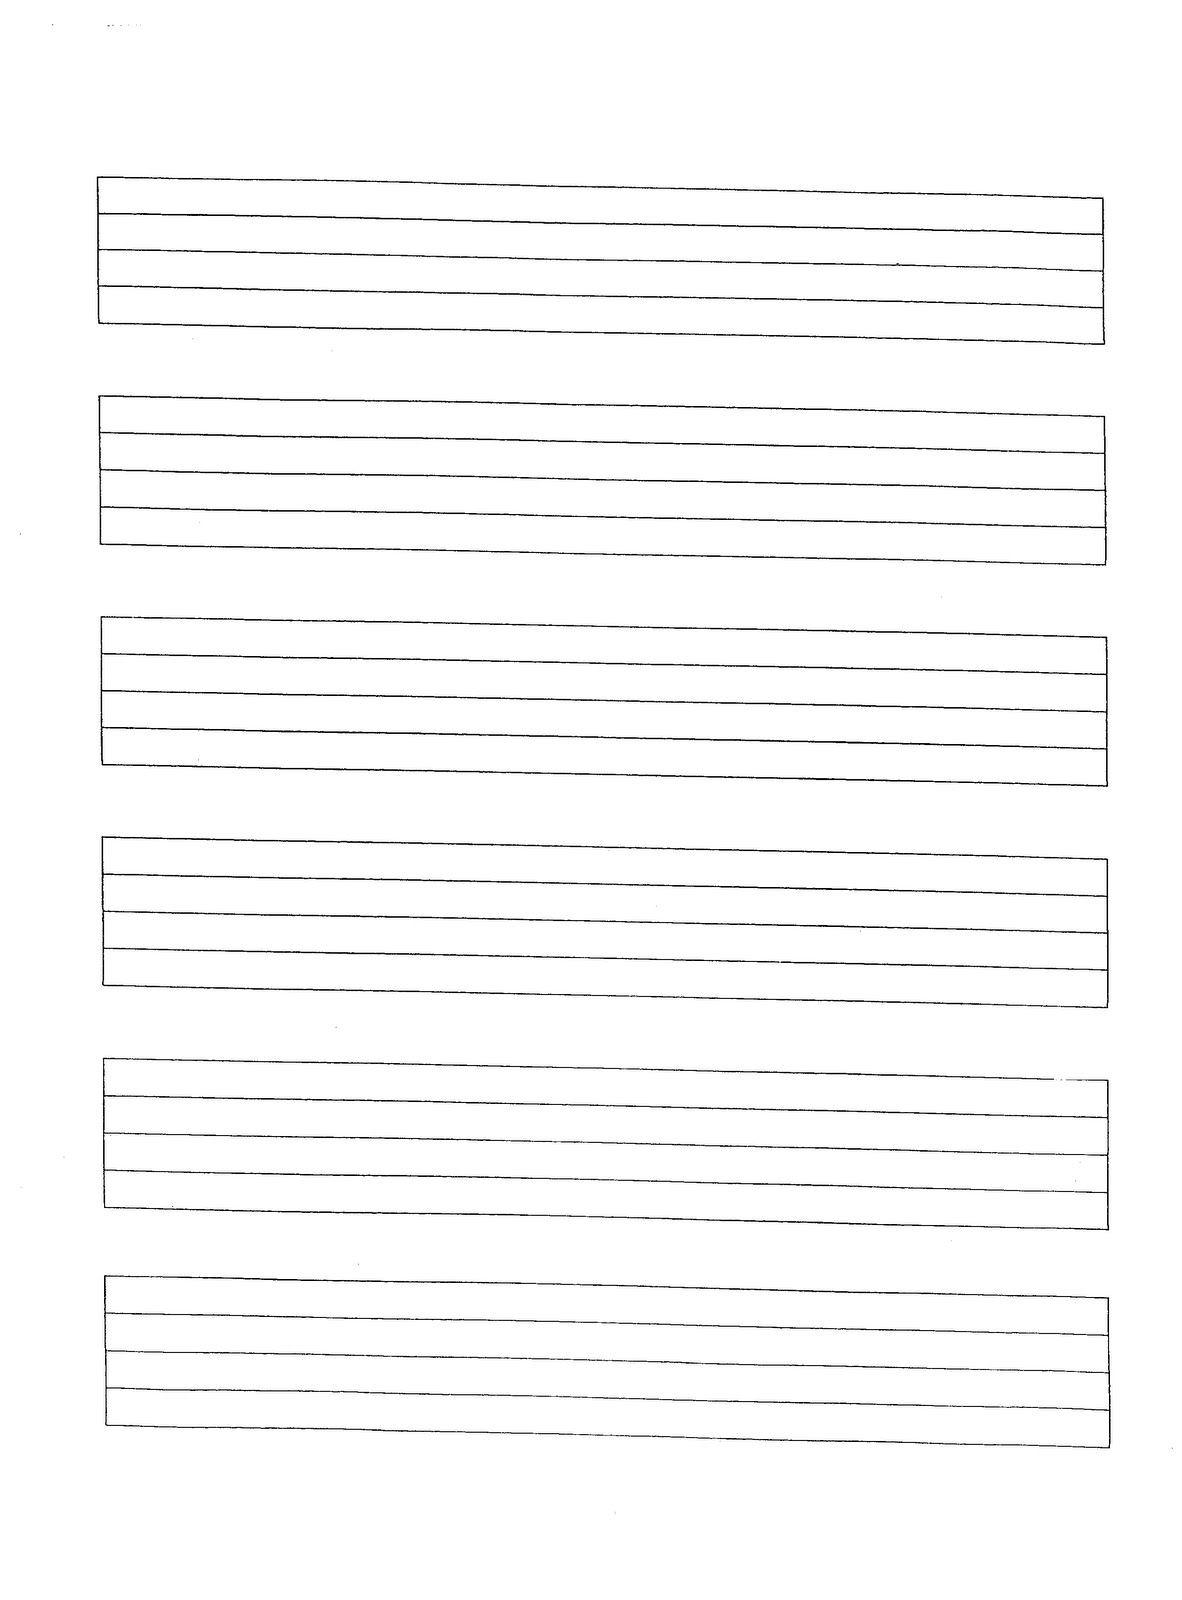 Music M Cript Paper Free Printable